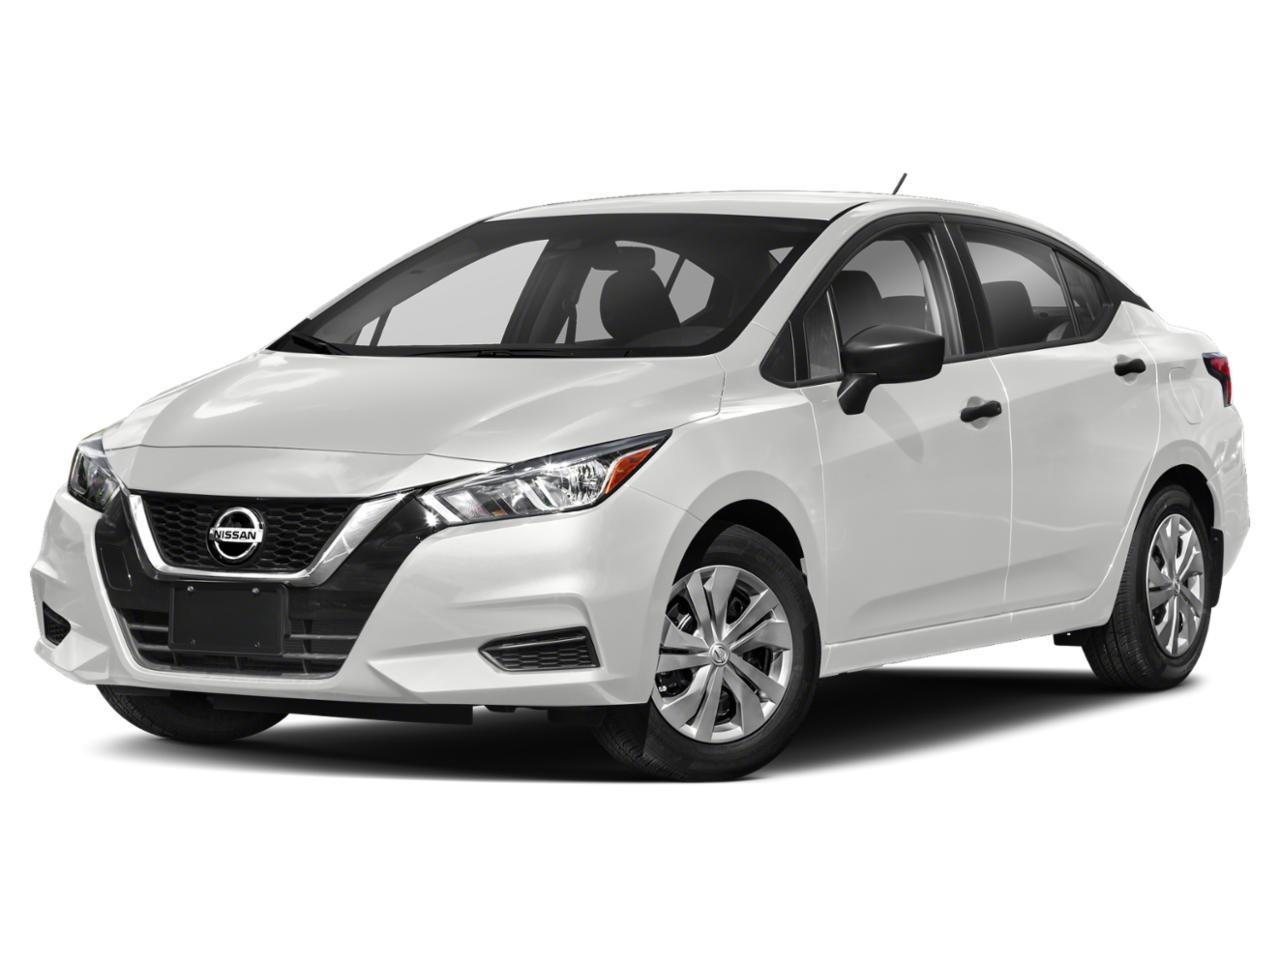 2020 Nissan Versa Vehicle Photo in Beaufort, SC 29906